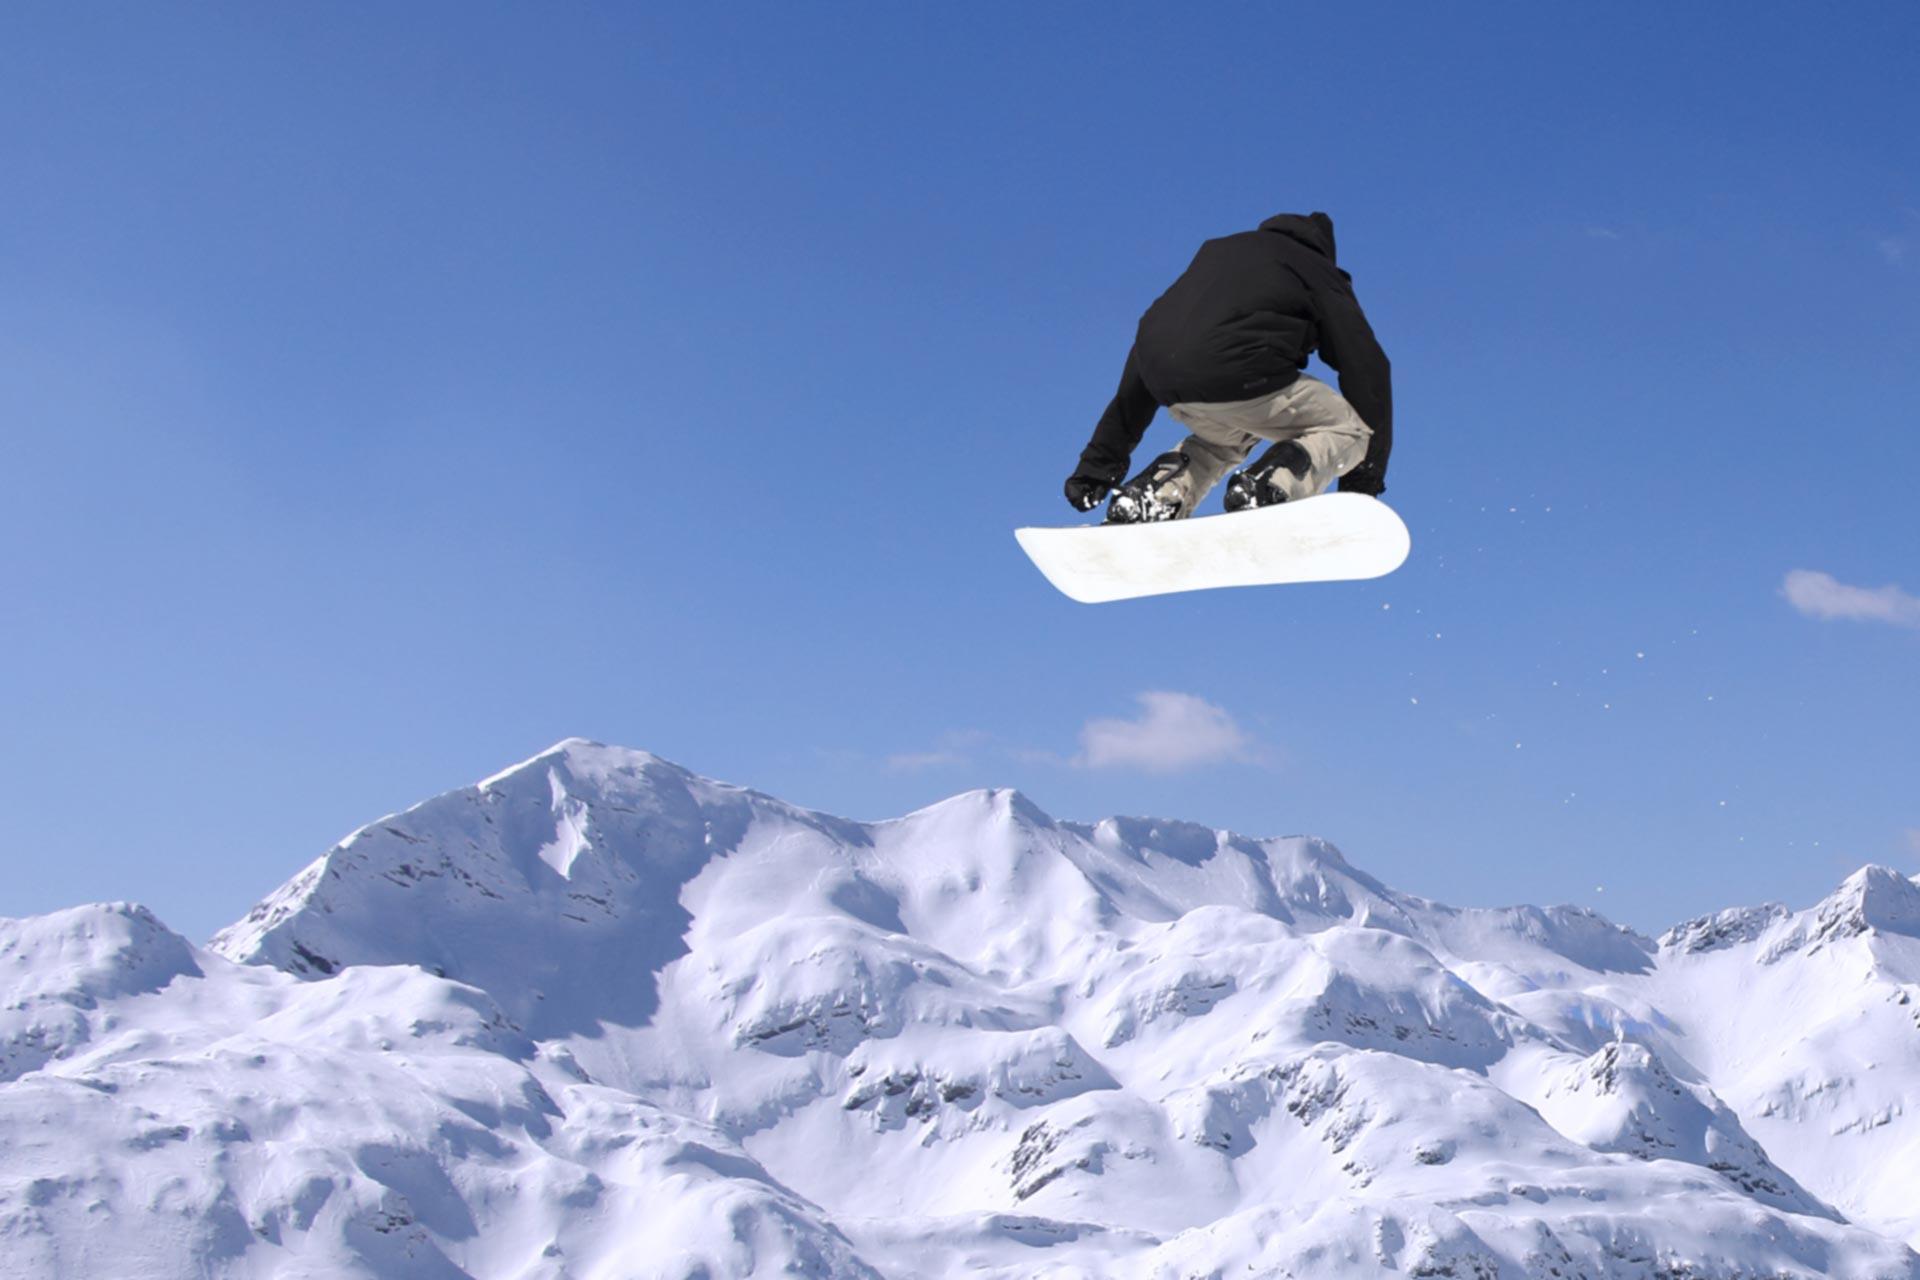 TD3 Snowboard